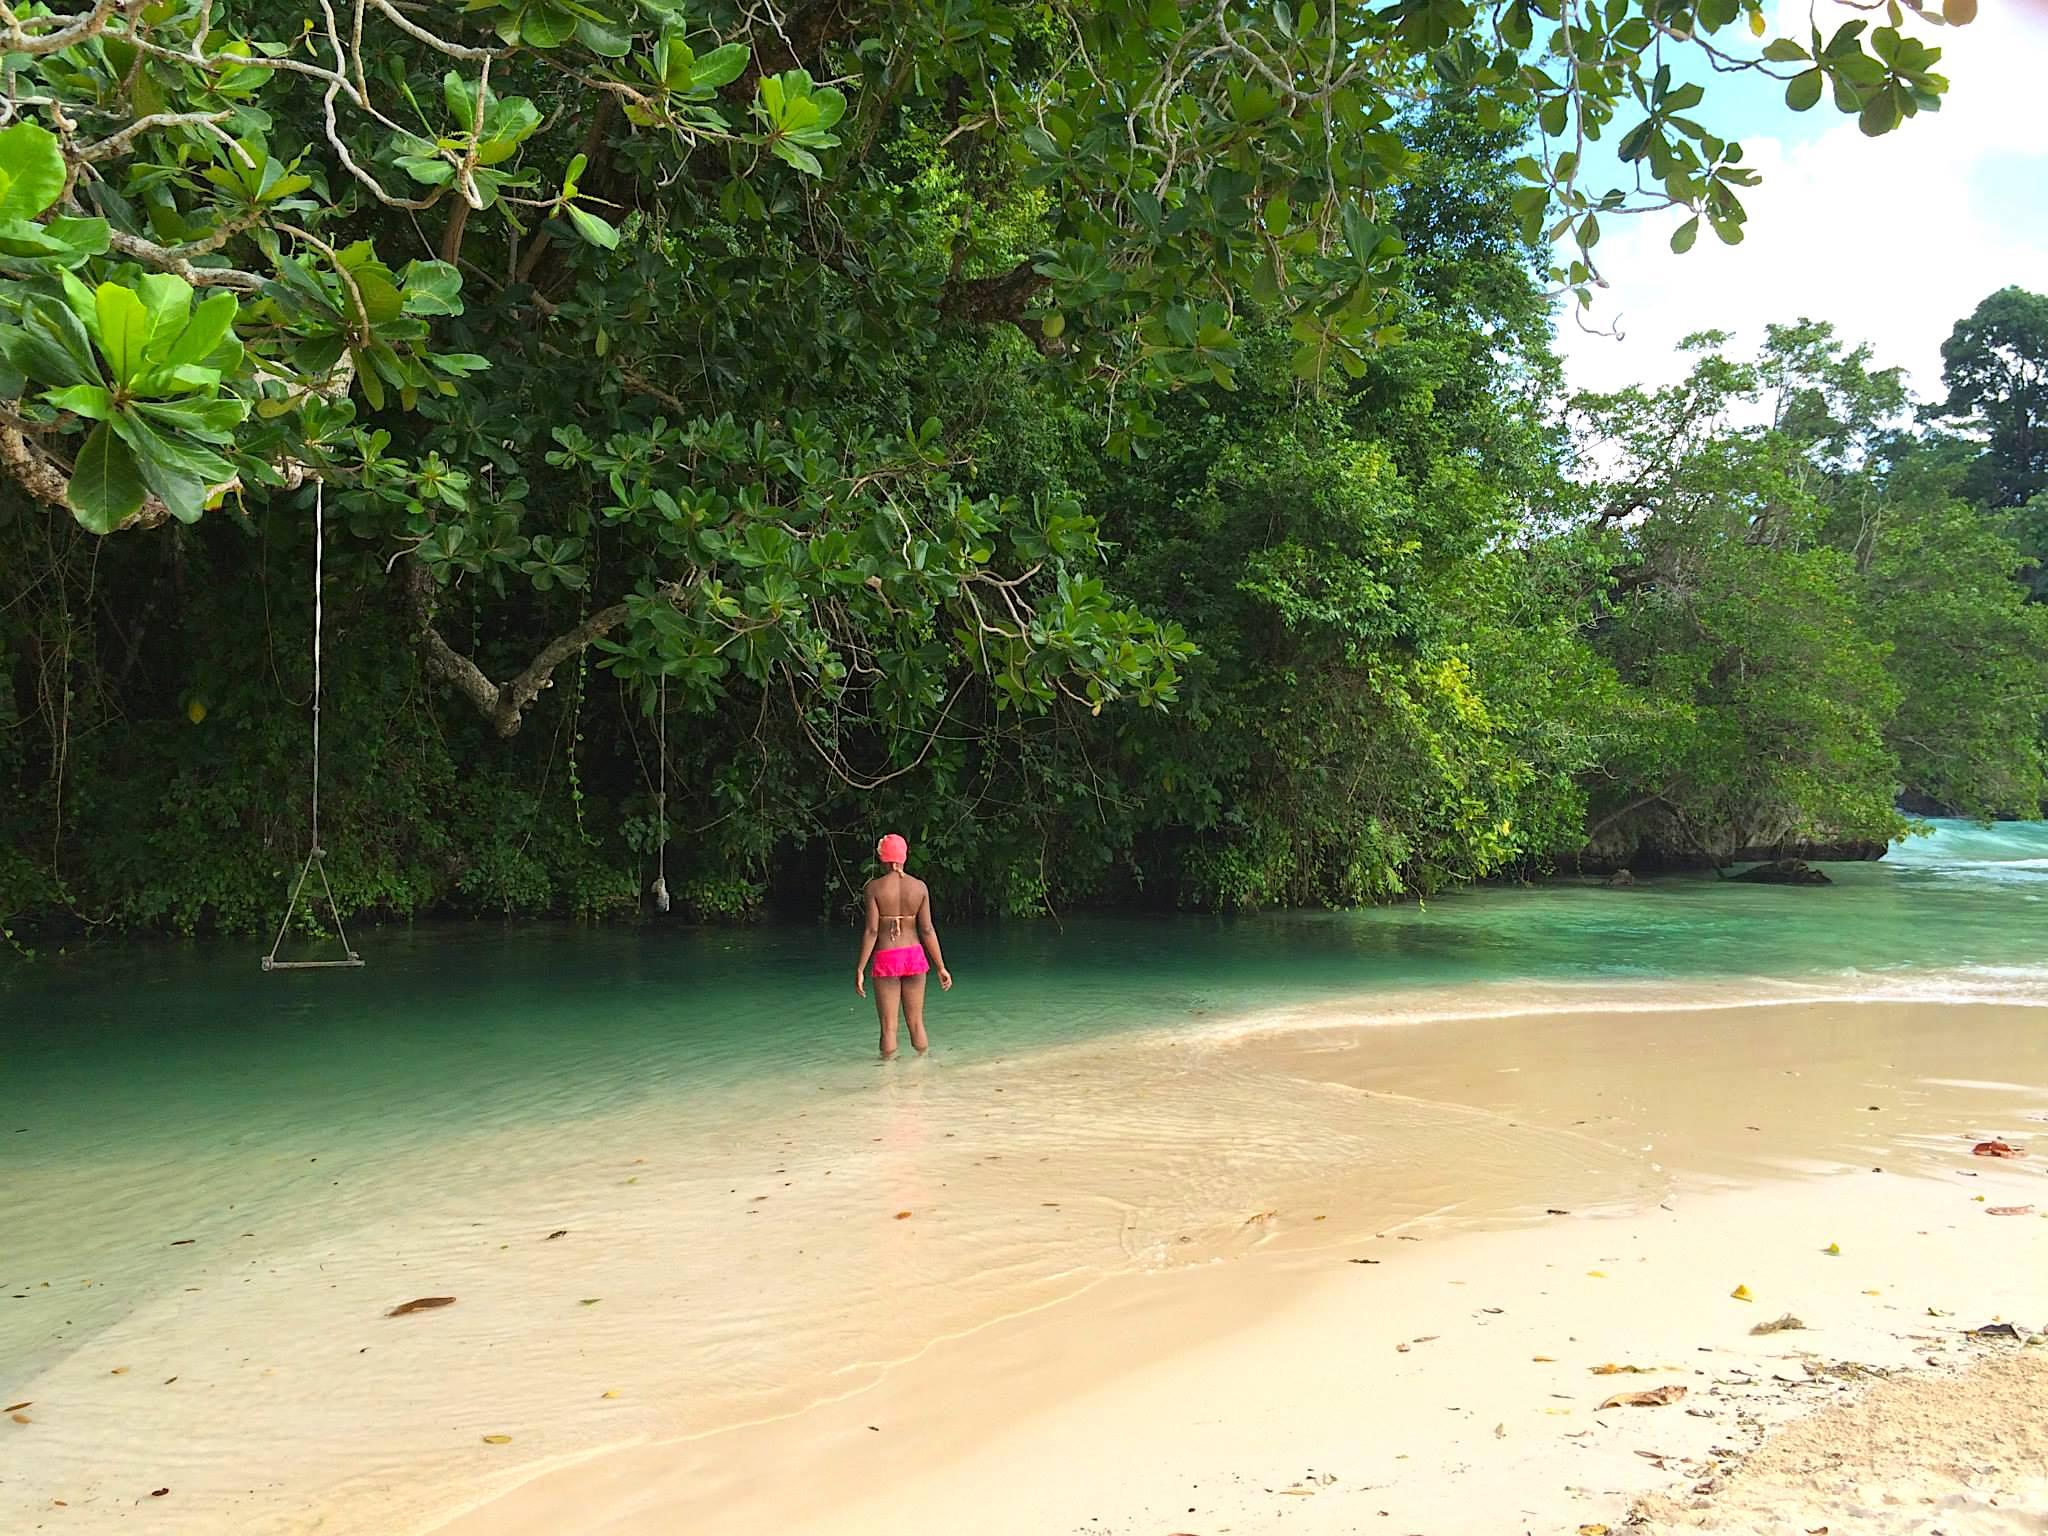 Frenchman's cove, Jamaica. Foto: Patti Neves